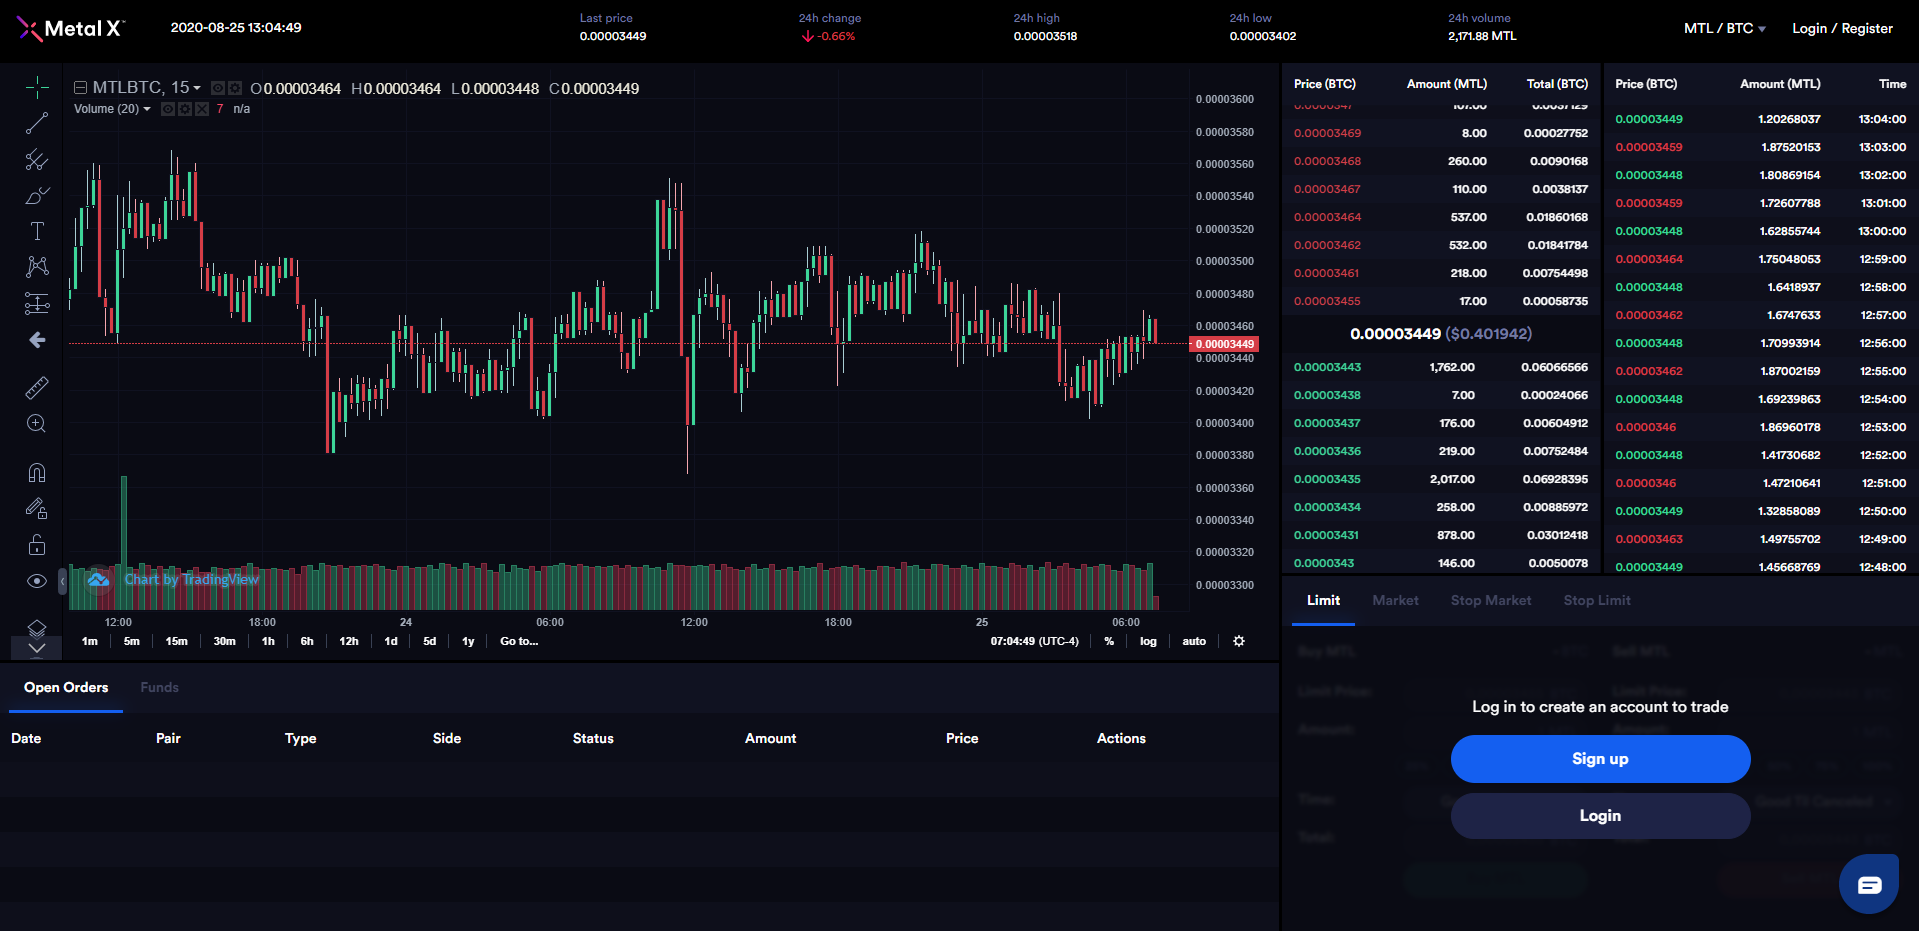 Metal X Exchange Trading View